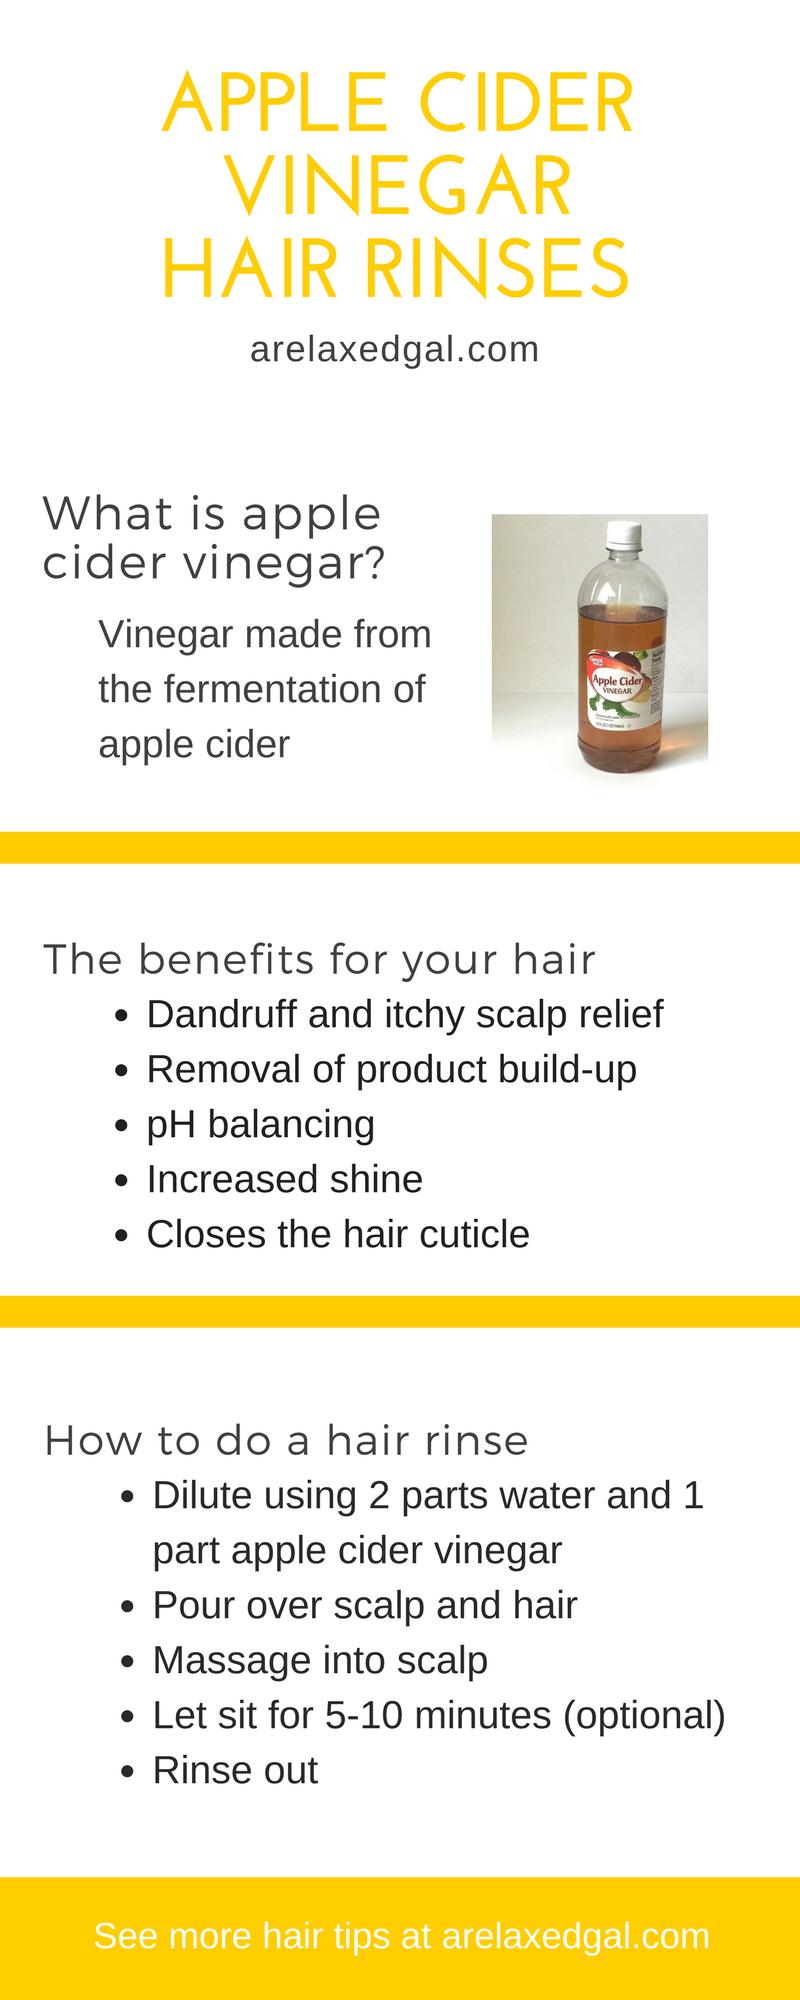 Why I Rinse My Hair With Apple Cider Vinegar | Natural hair remedies, Hair  dandruff, Apple cider vinegar hair rinse